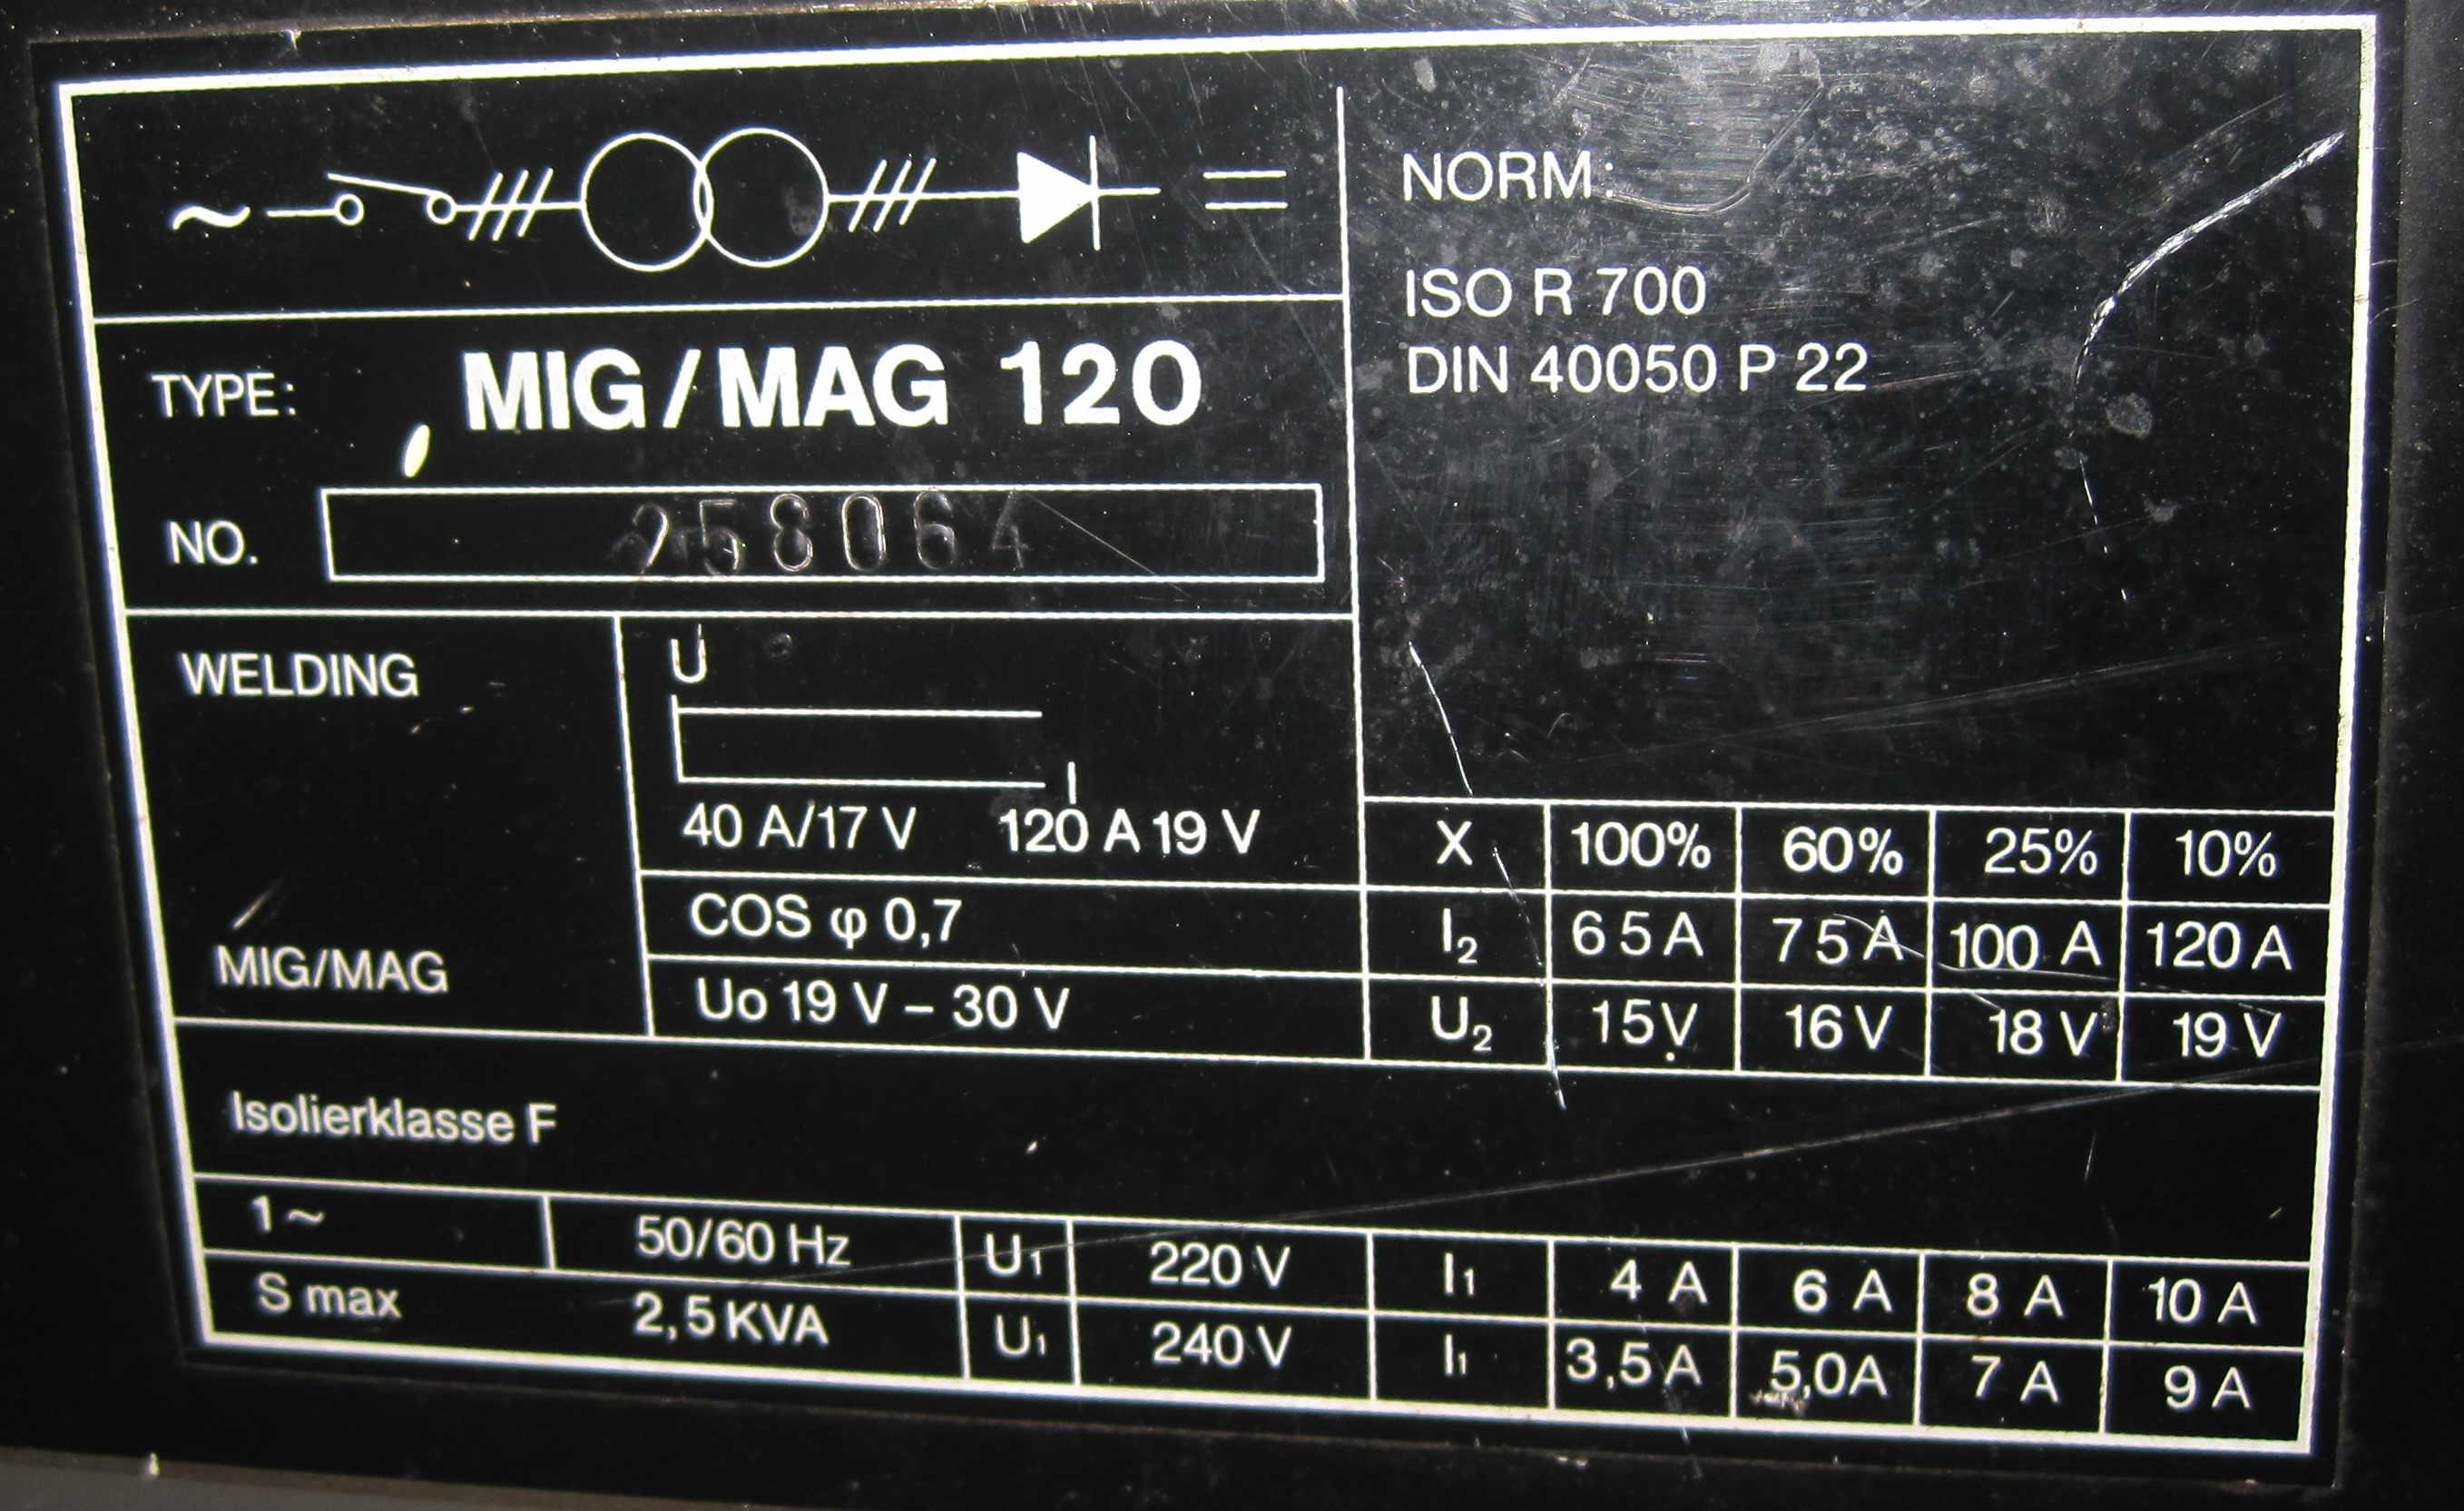 Berühmt 120 V Schaltung Fotos - Elektrische Schaltplan-Ideen ...